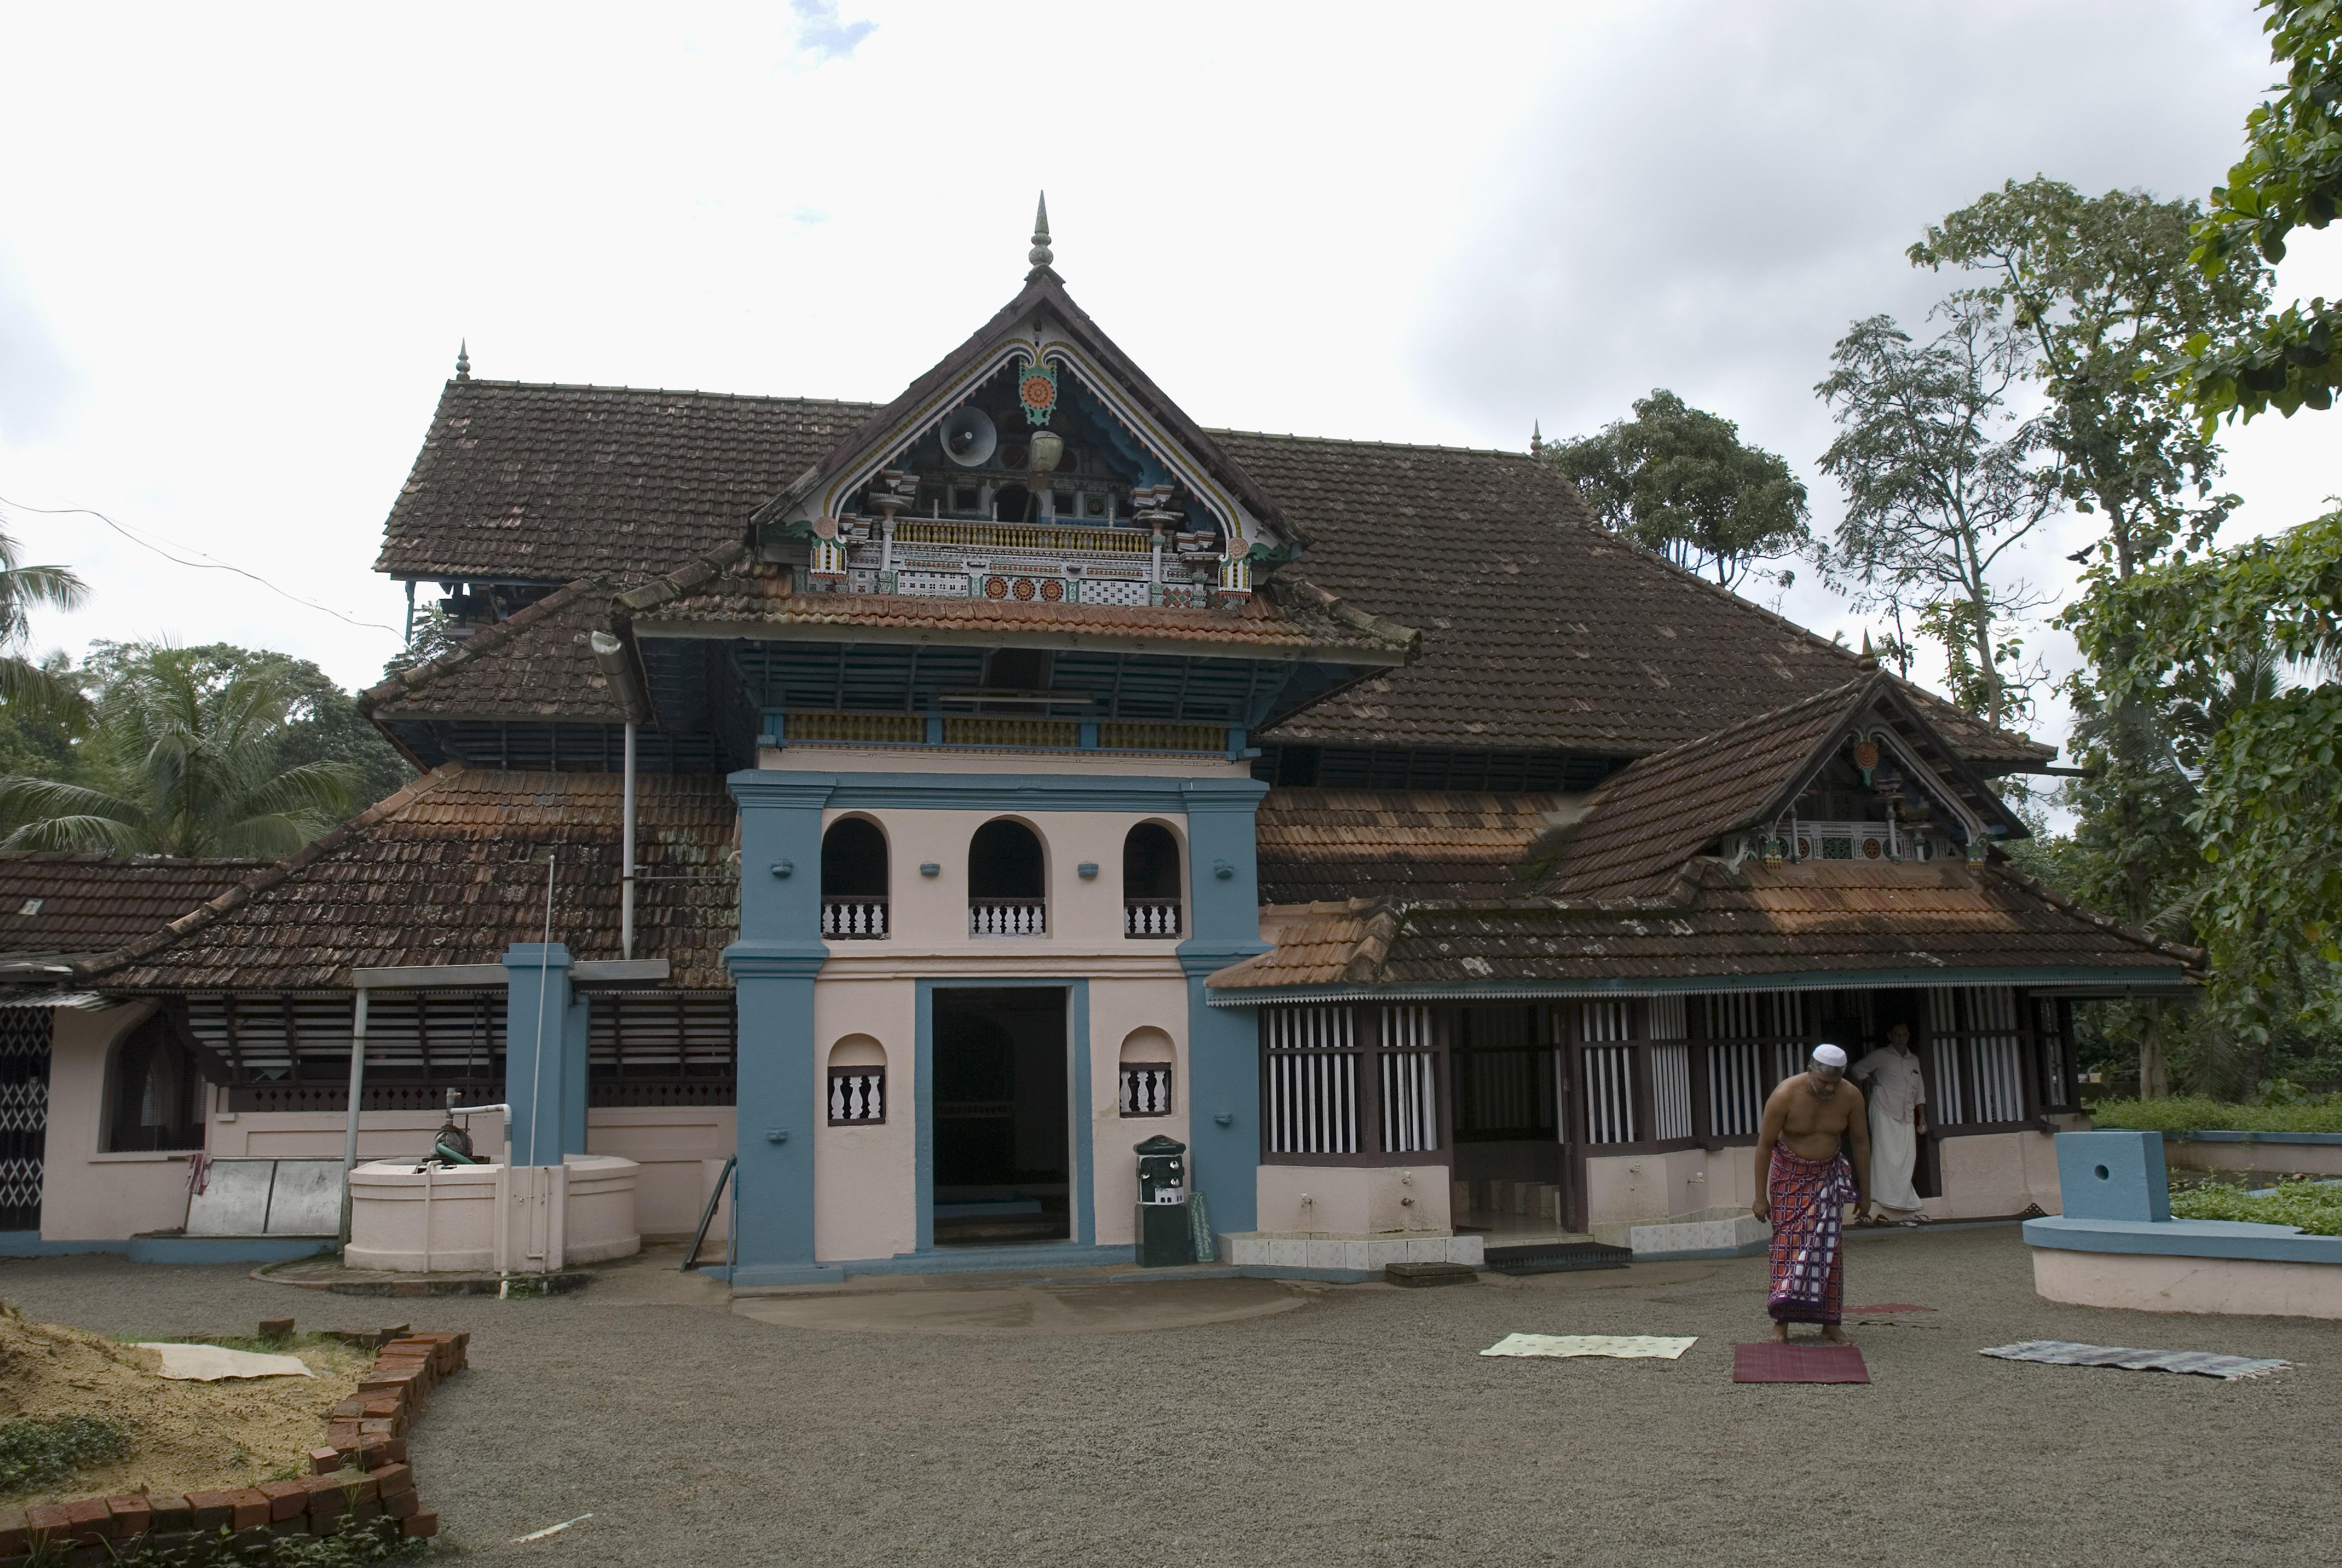 Thazhathangady Juma Masjid, in the state of Kerala, India.